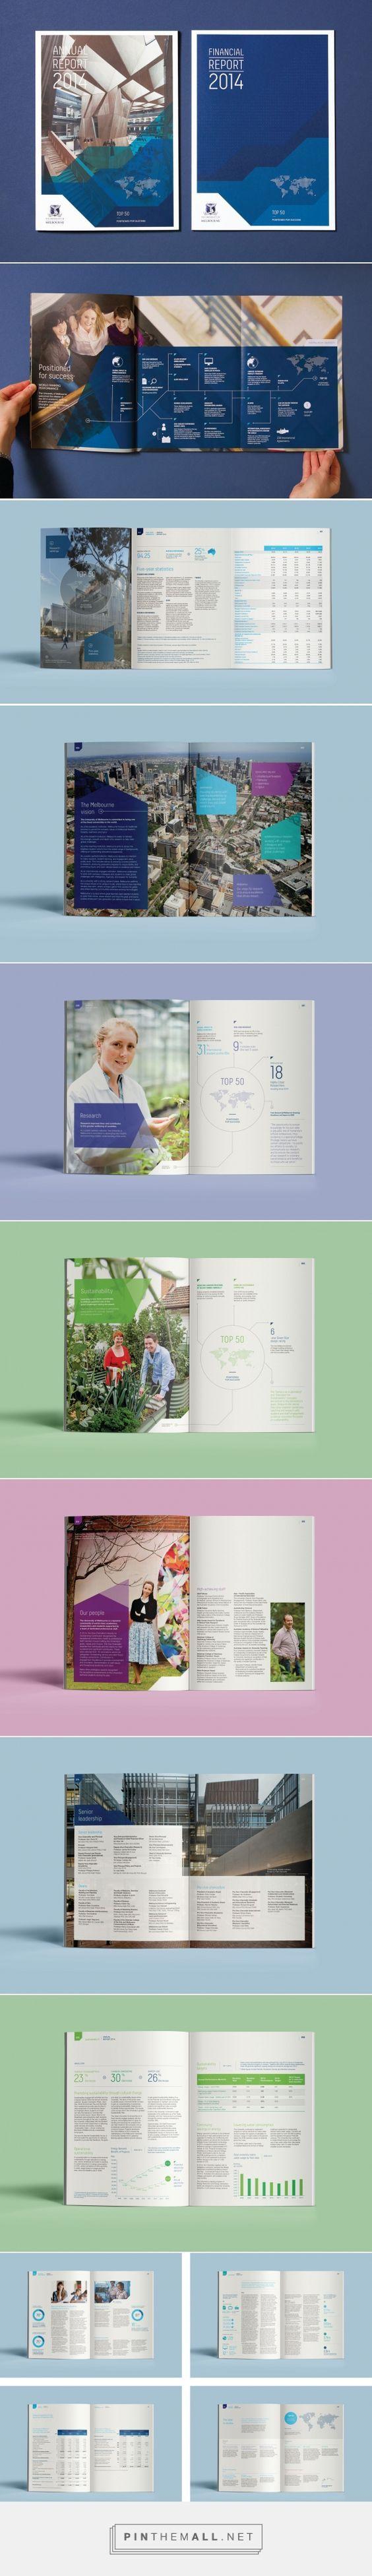 University of Melbourne Annual Report - Studio Binocular - created via https://pinthemall.net